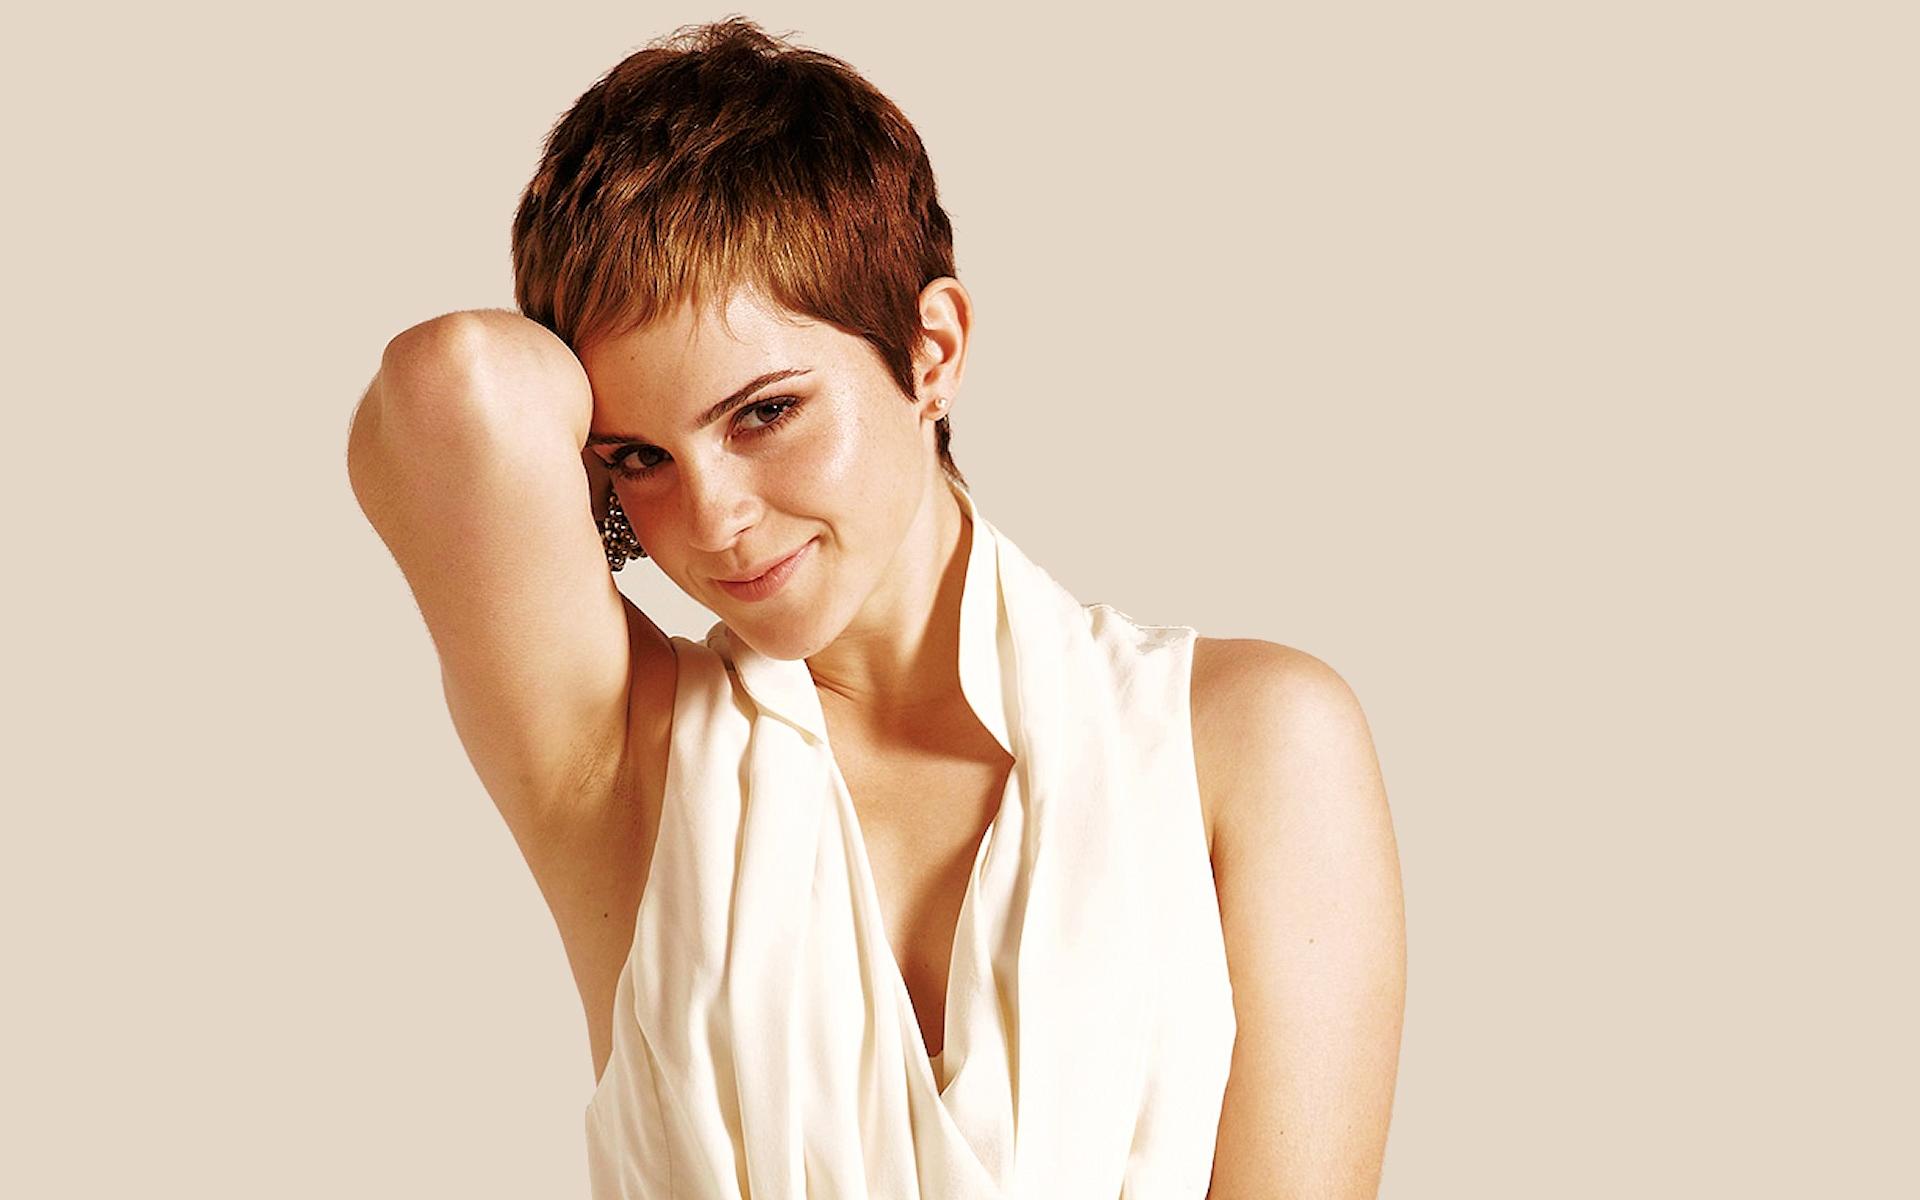 Emma Watson 267 wallpaper download